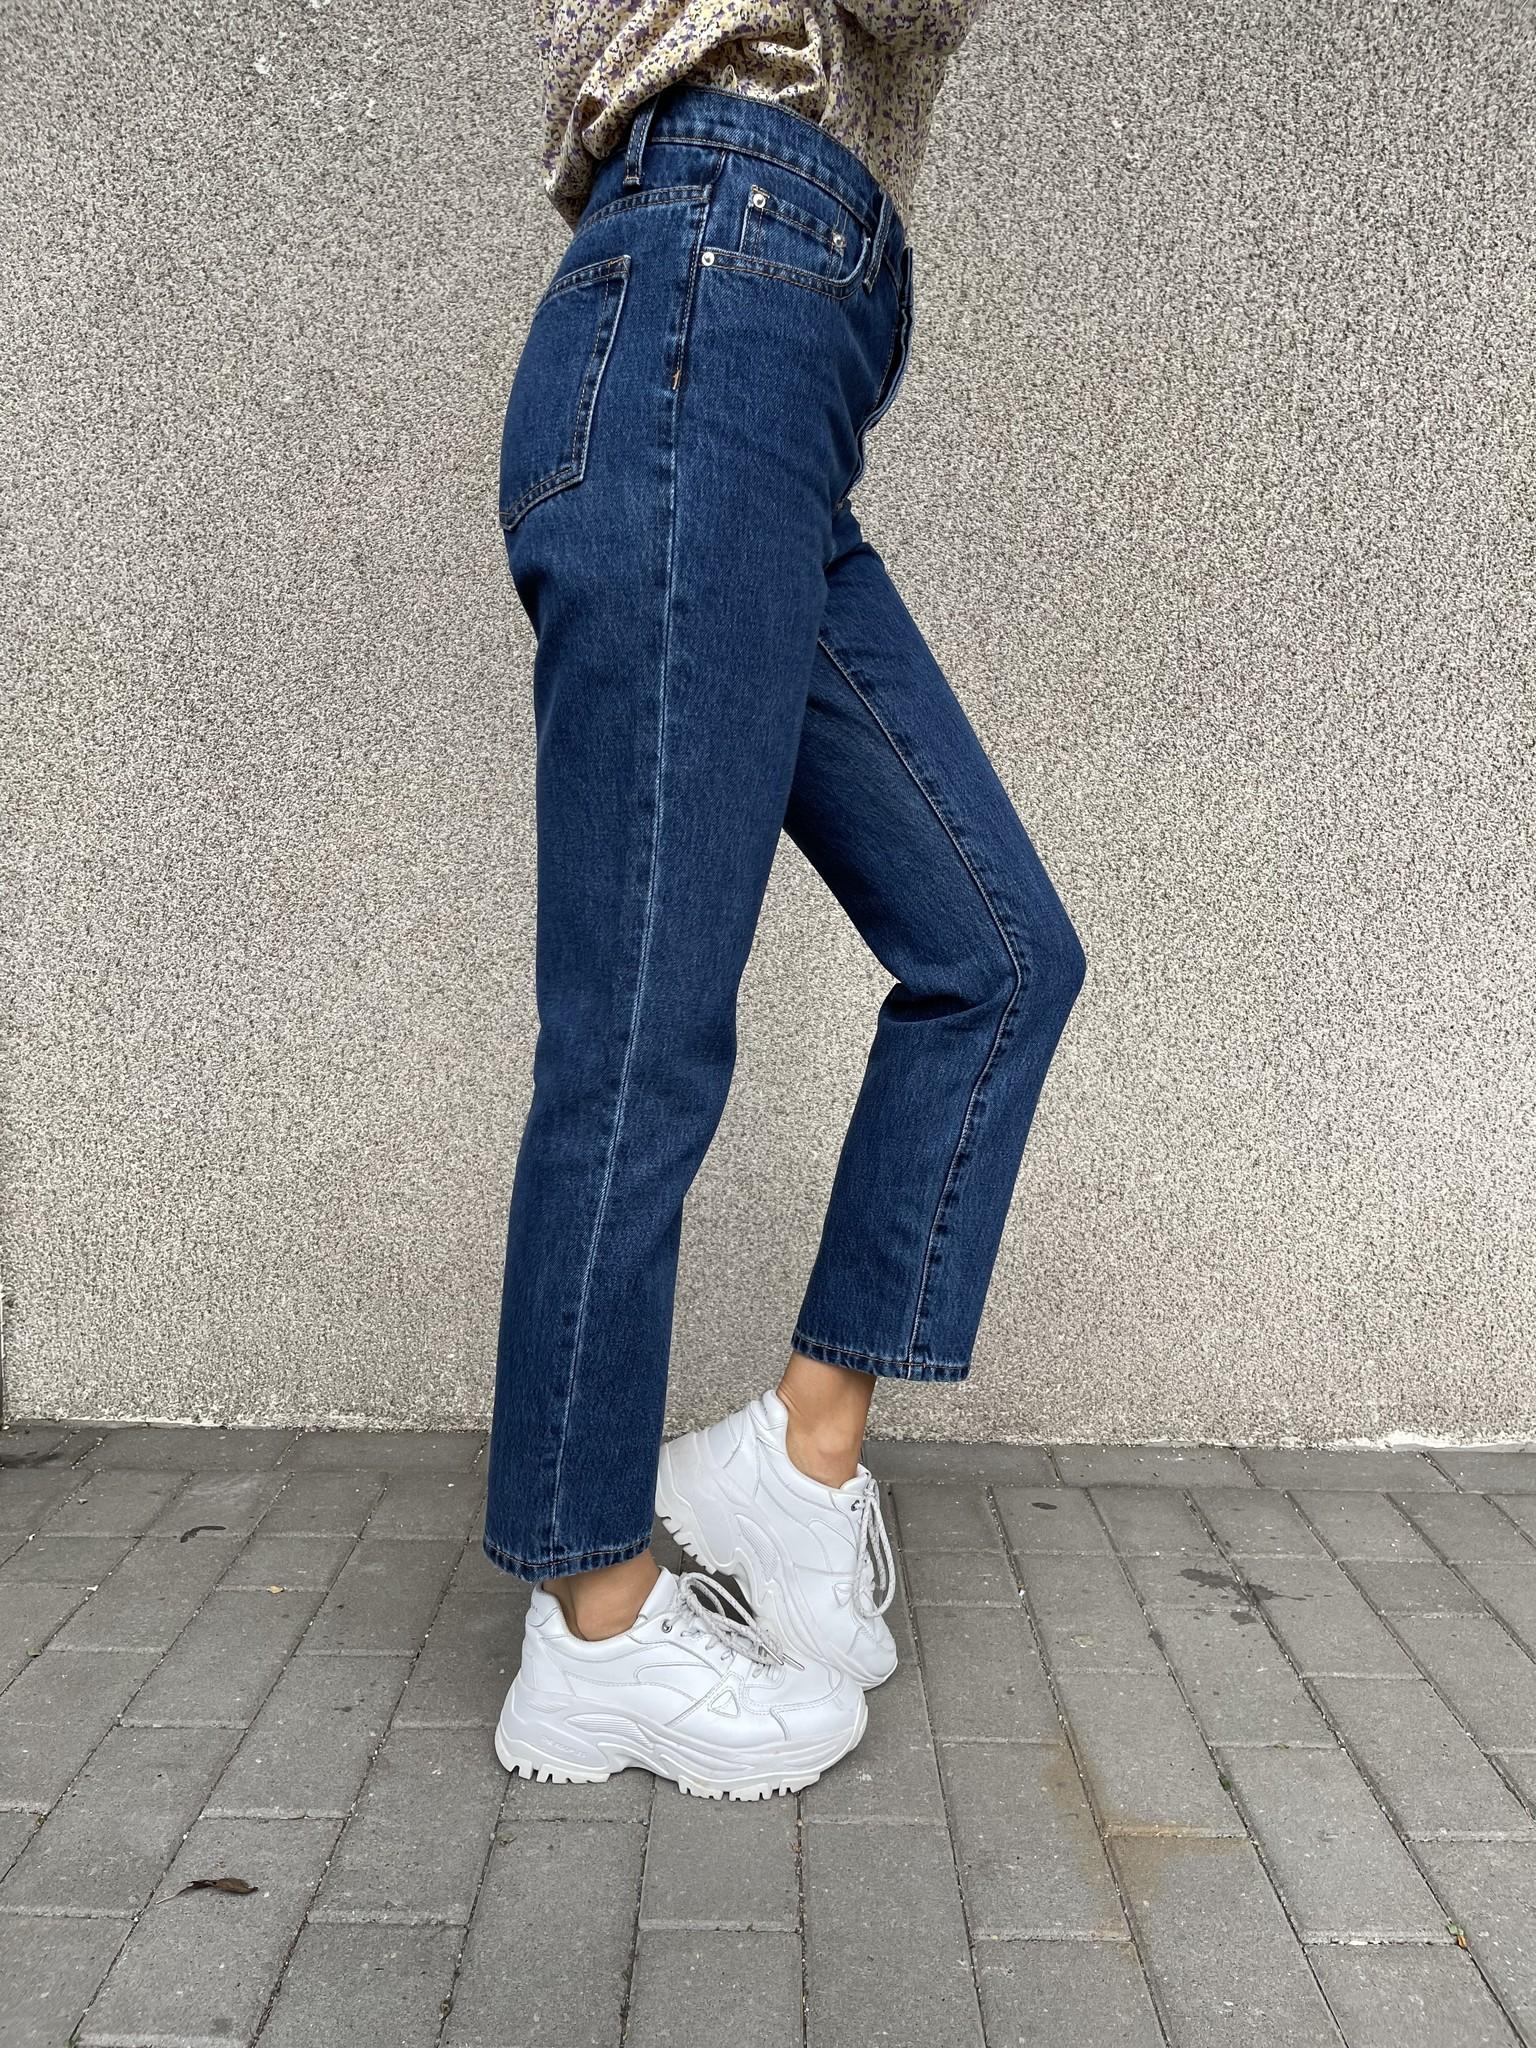 PONY jeans-7